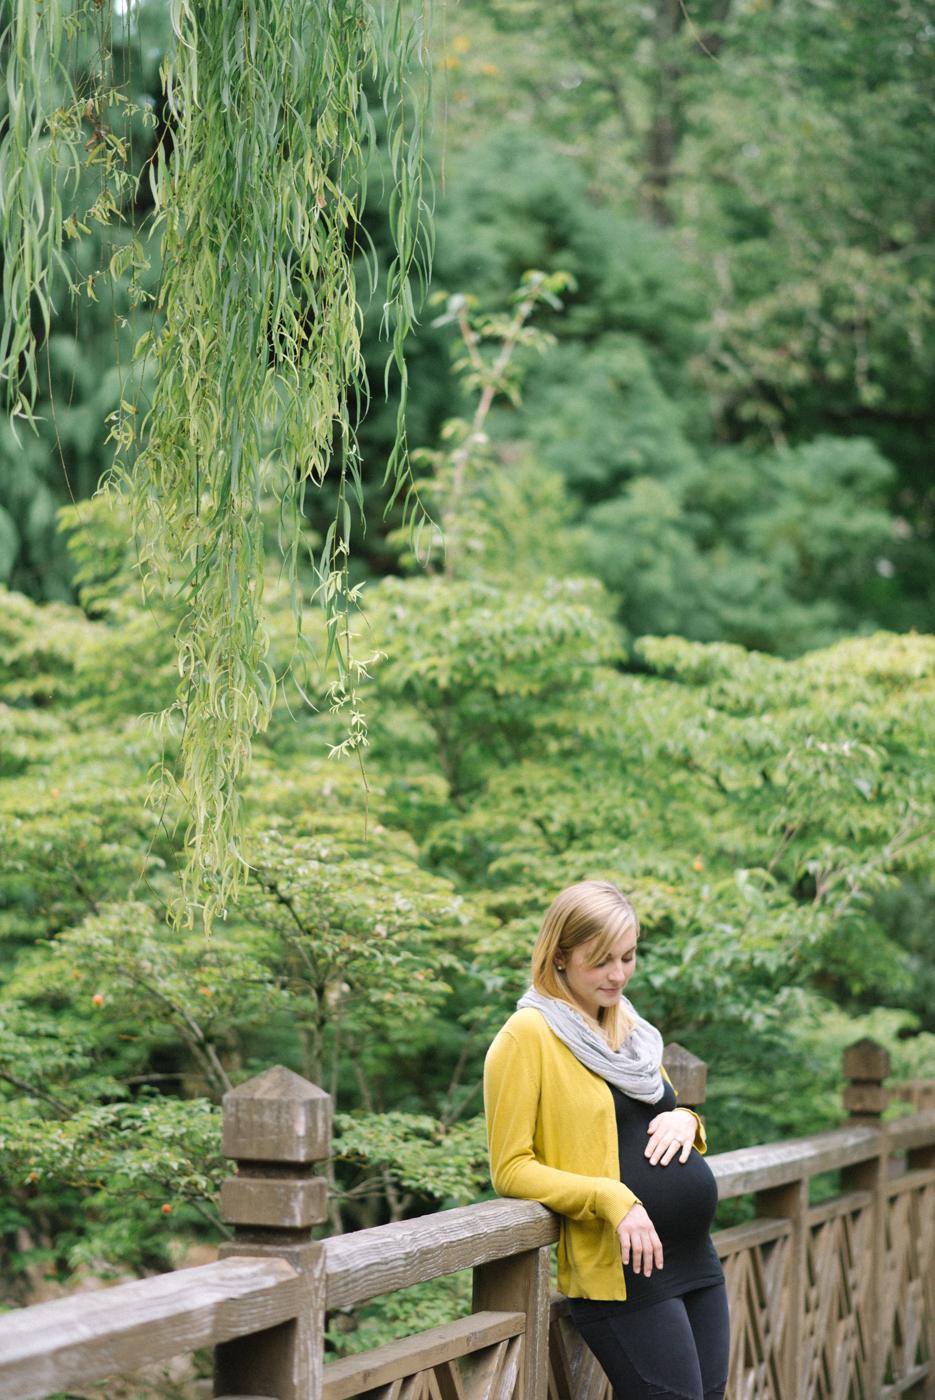 portland-oregon-maternity-photography-pregnancy-crystal-springs-rhododendron-garden-bridge-sweet-romantic-shelley-marie-photo-1